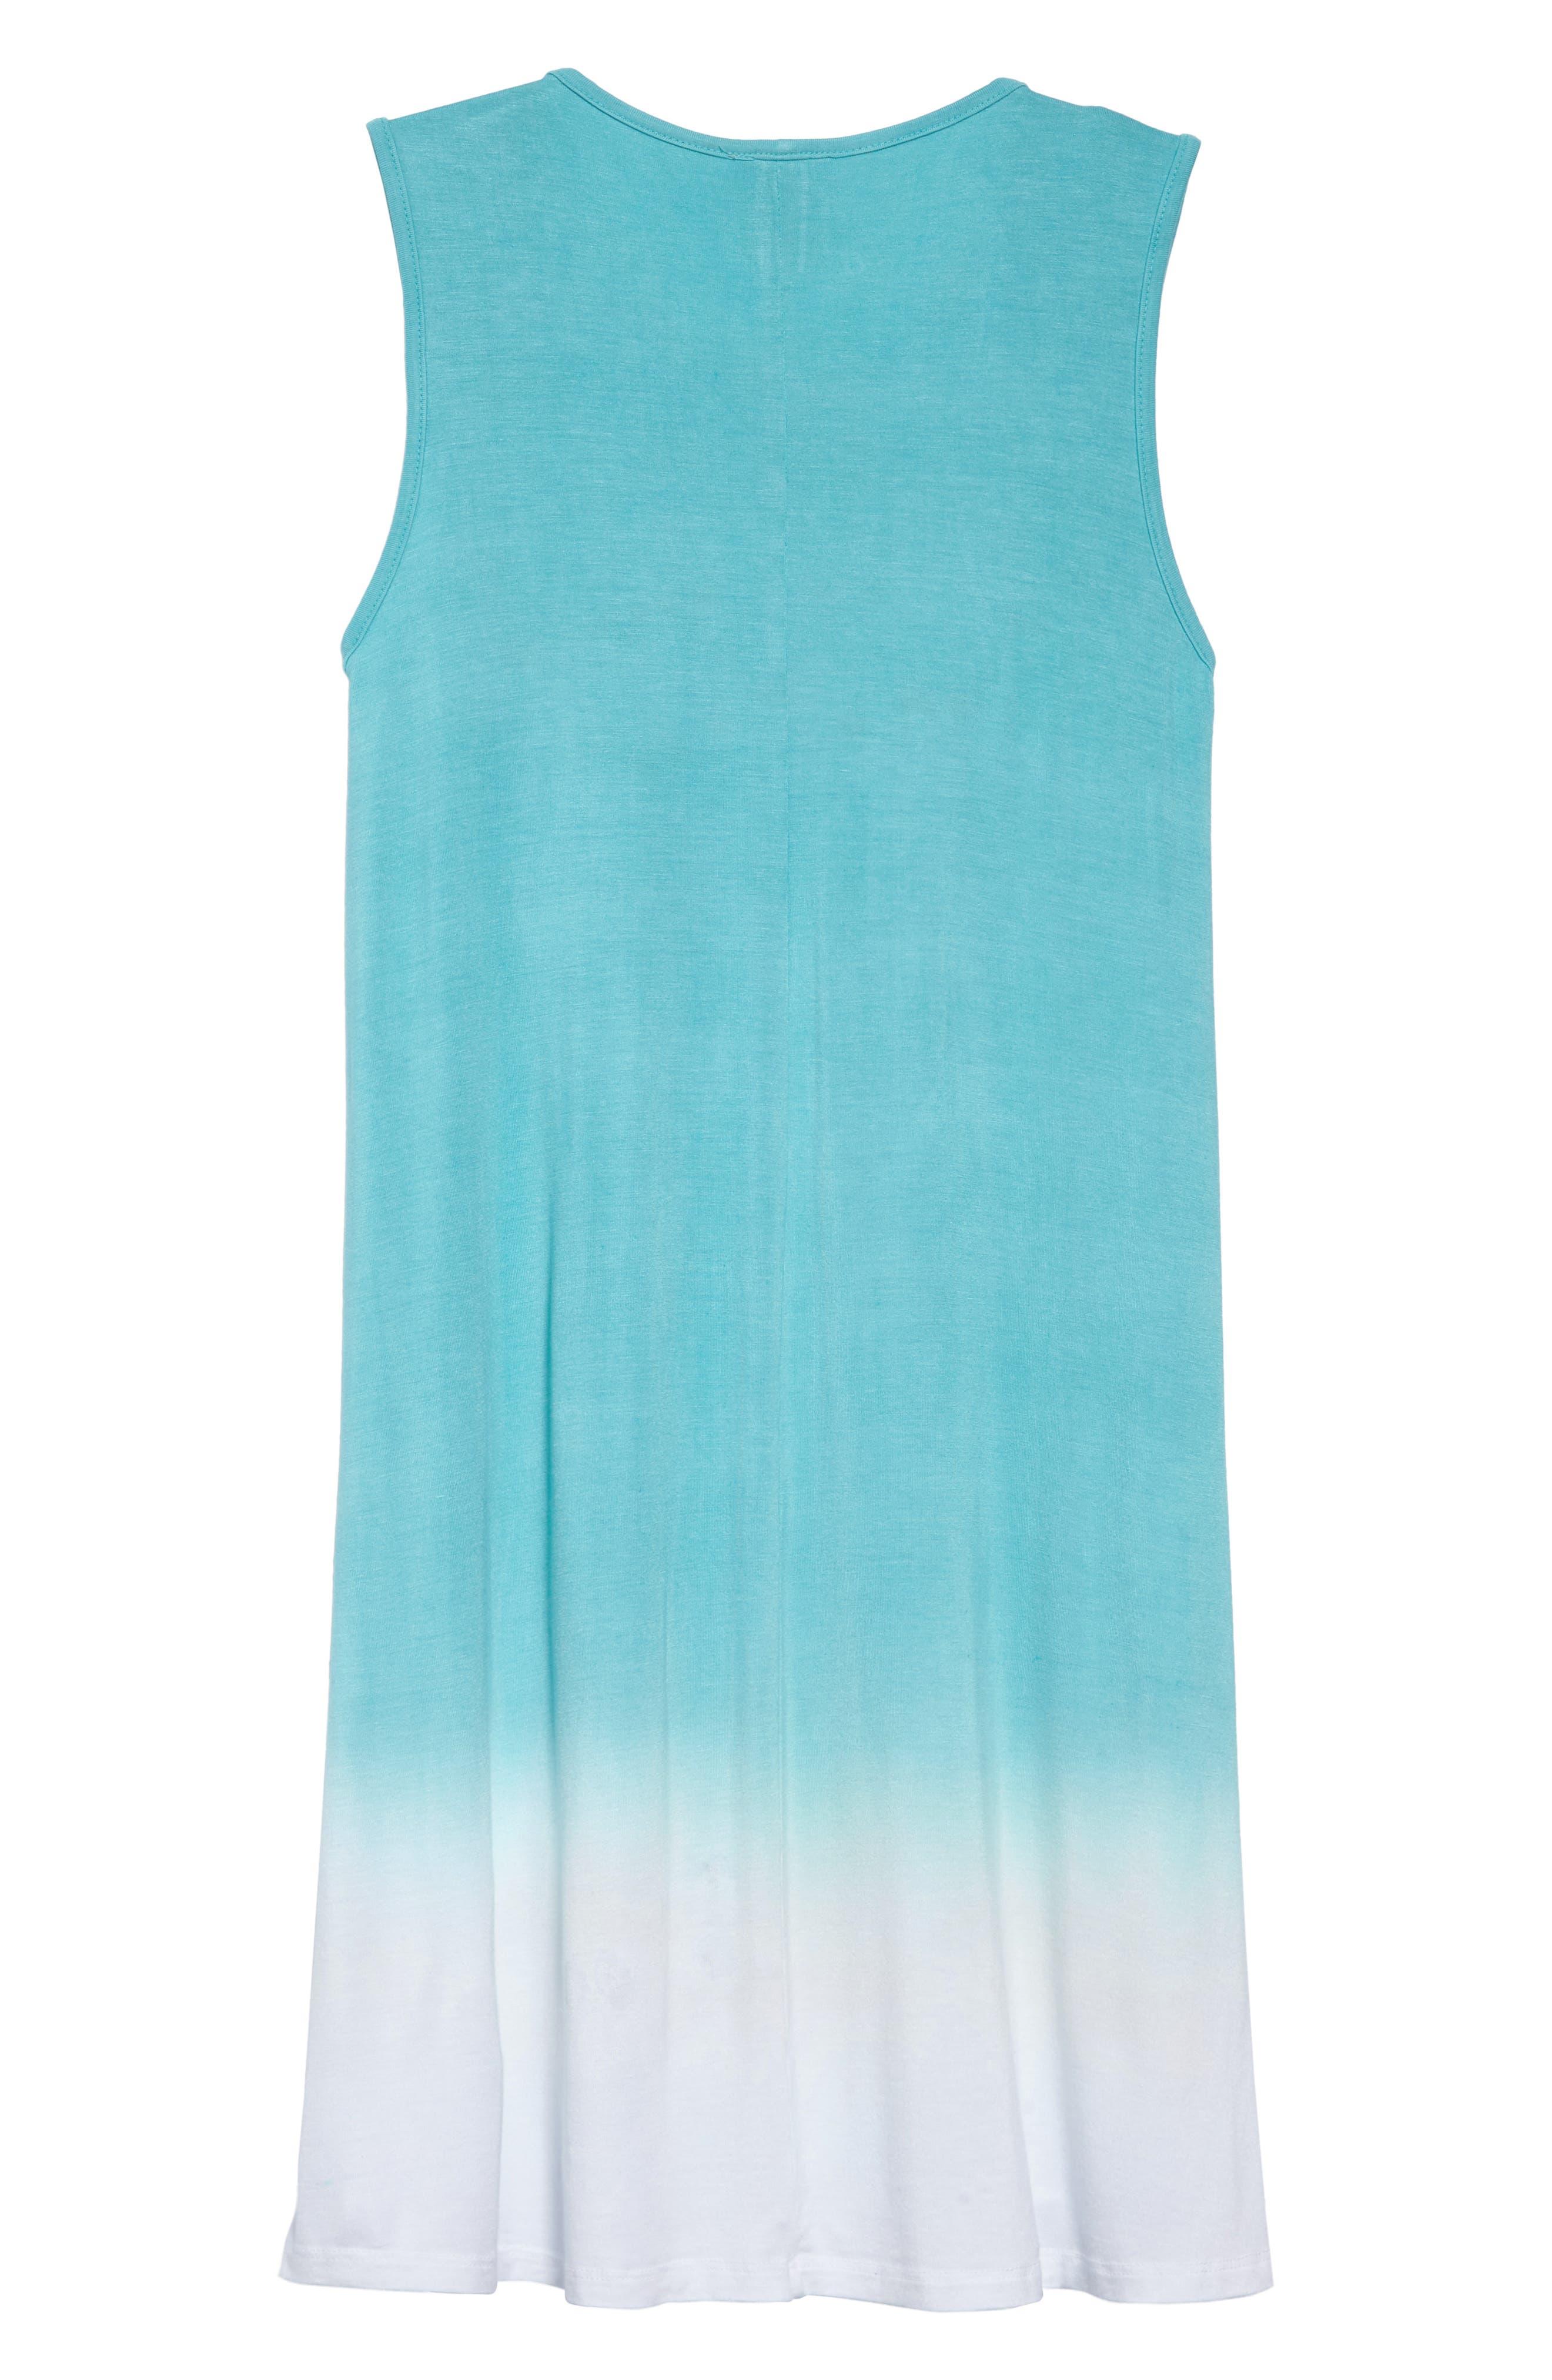 Grenadine Ombré T-Shirt Dress,                             Alternate thumbnail 2, color,                             Pool Blue